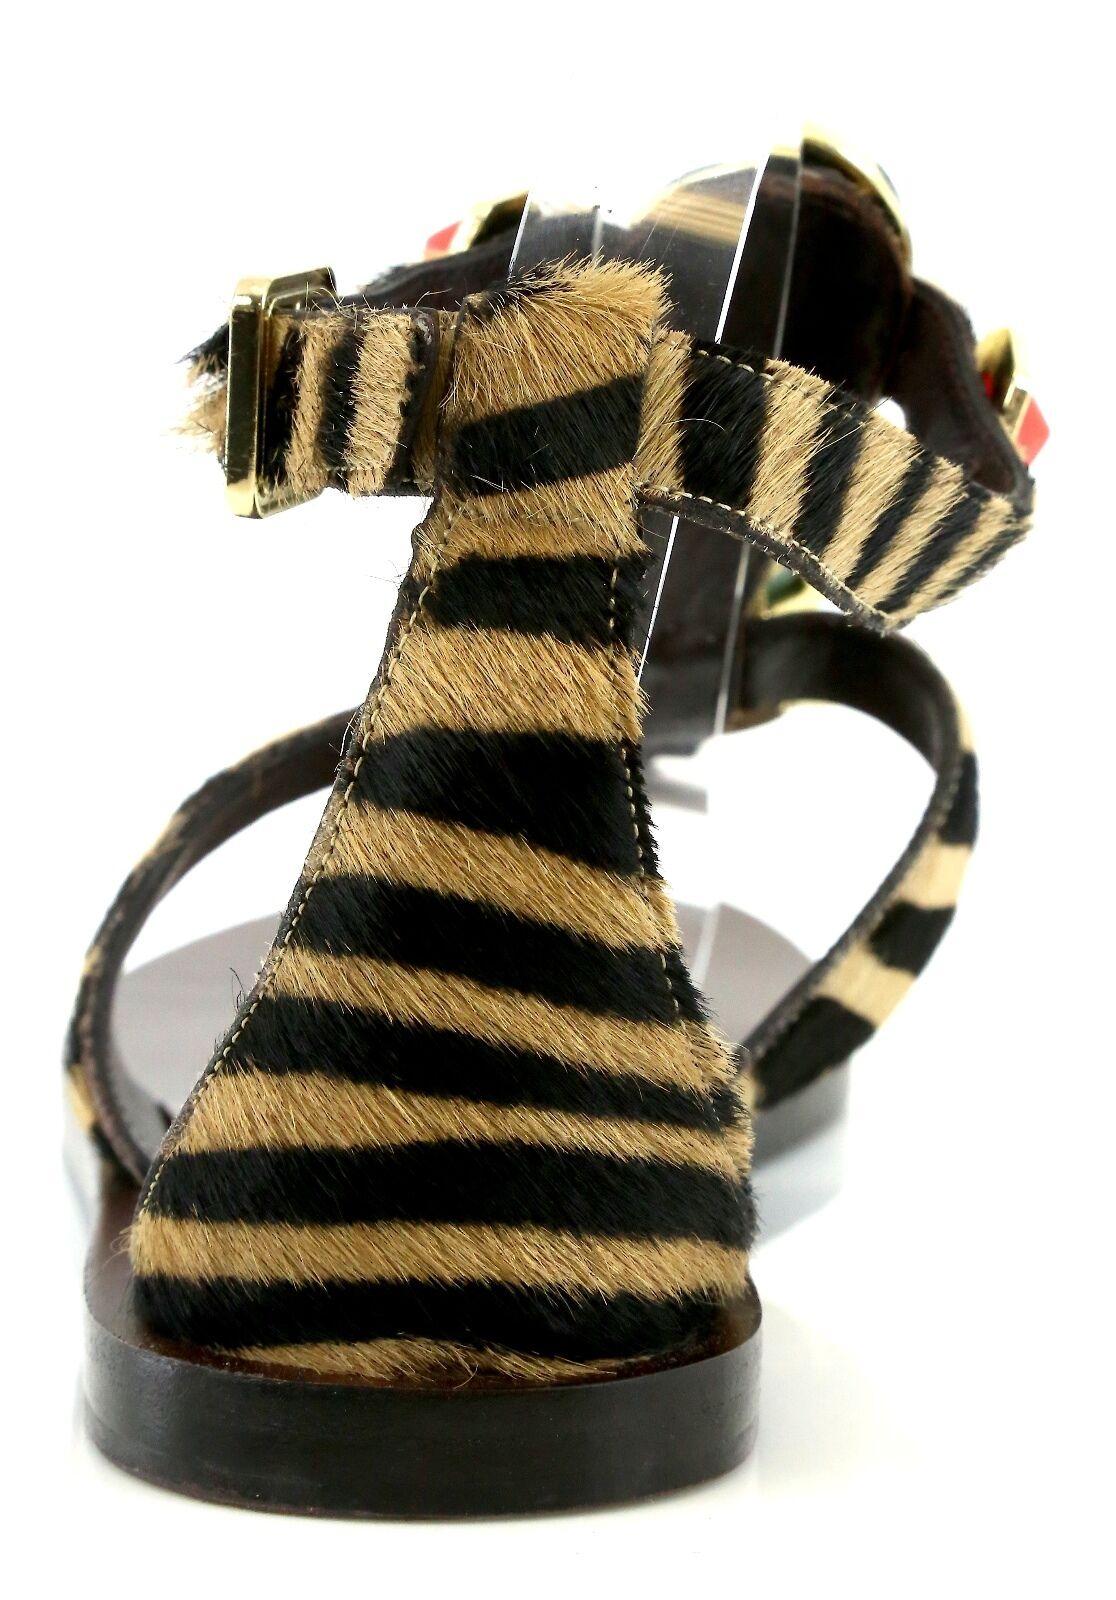 Miss.Trish STONED Zebra Zebra Zebra Print Sandals W  Mulit-colord Stones 7371 Size 10 M NEW ddfde5